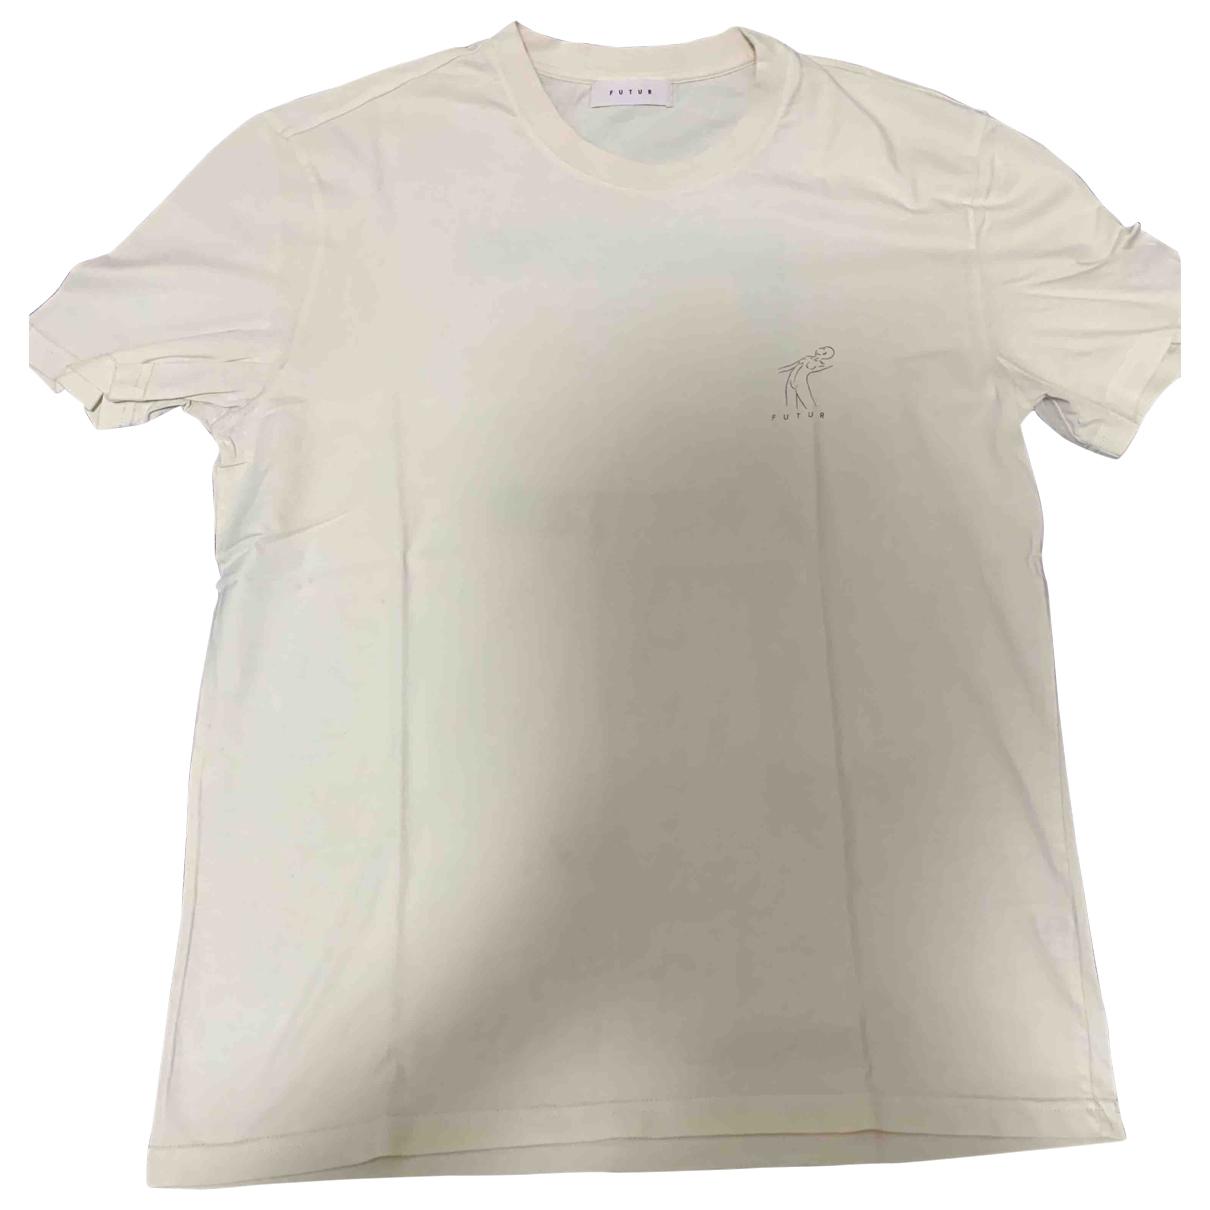 Futur \N Cotton T-shirts for Men S International